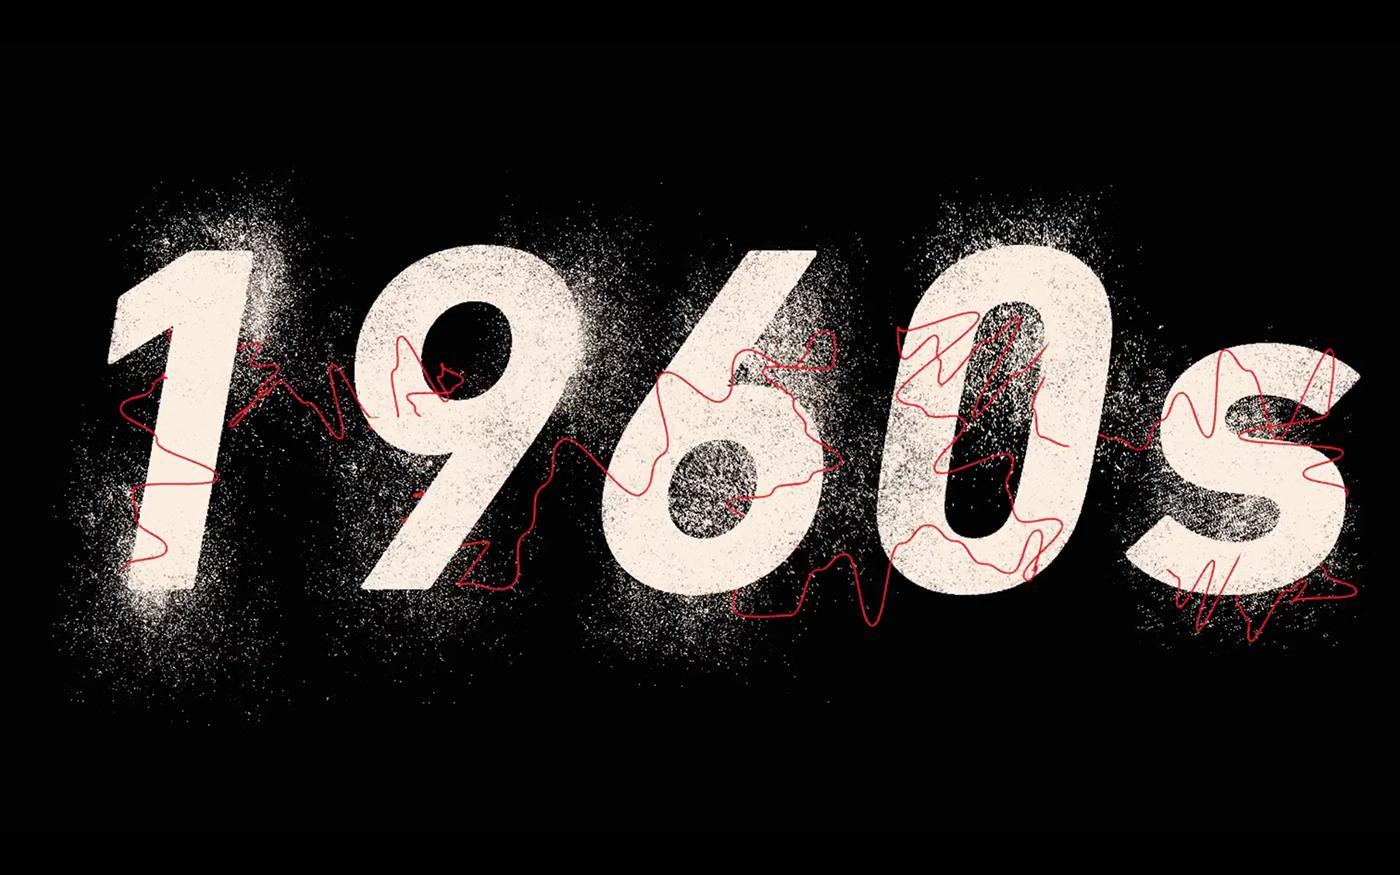 mai 68 china revolution gobelins france 文化大革命 學運 法國 中國